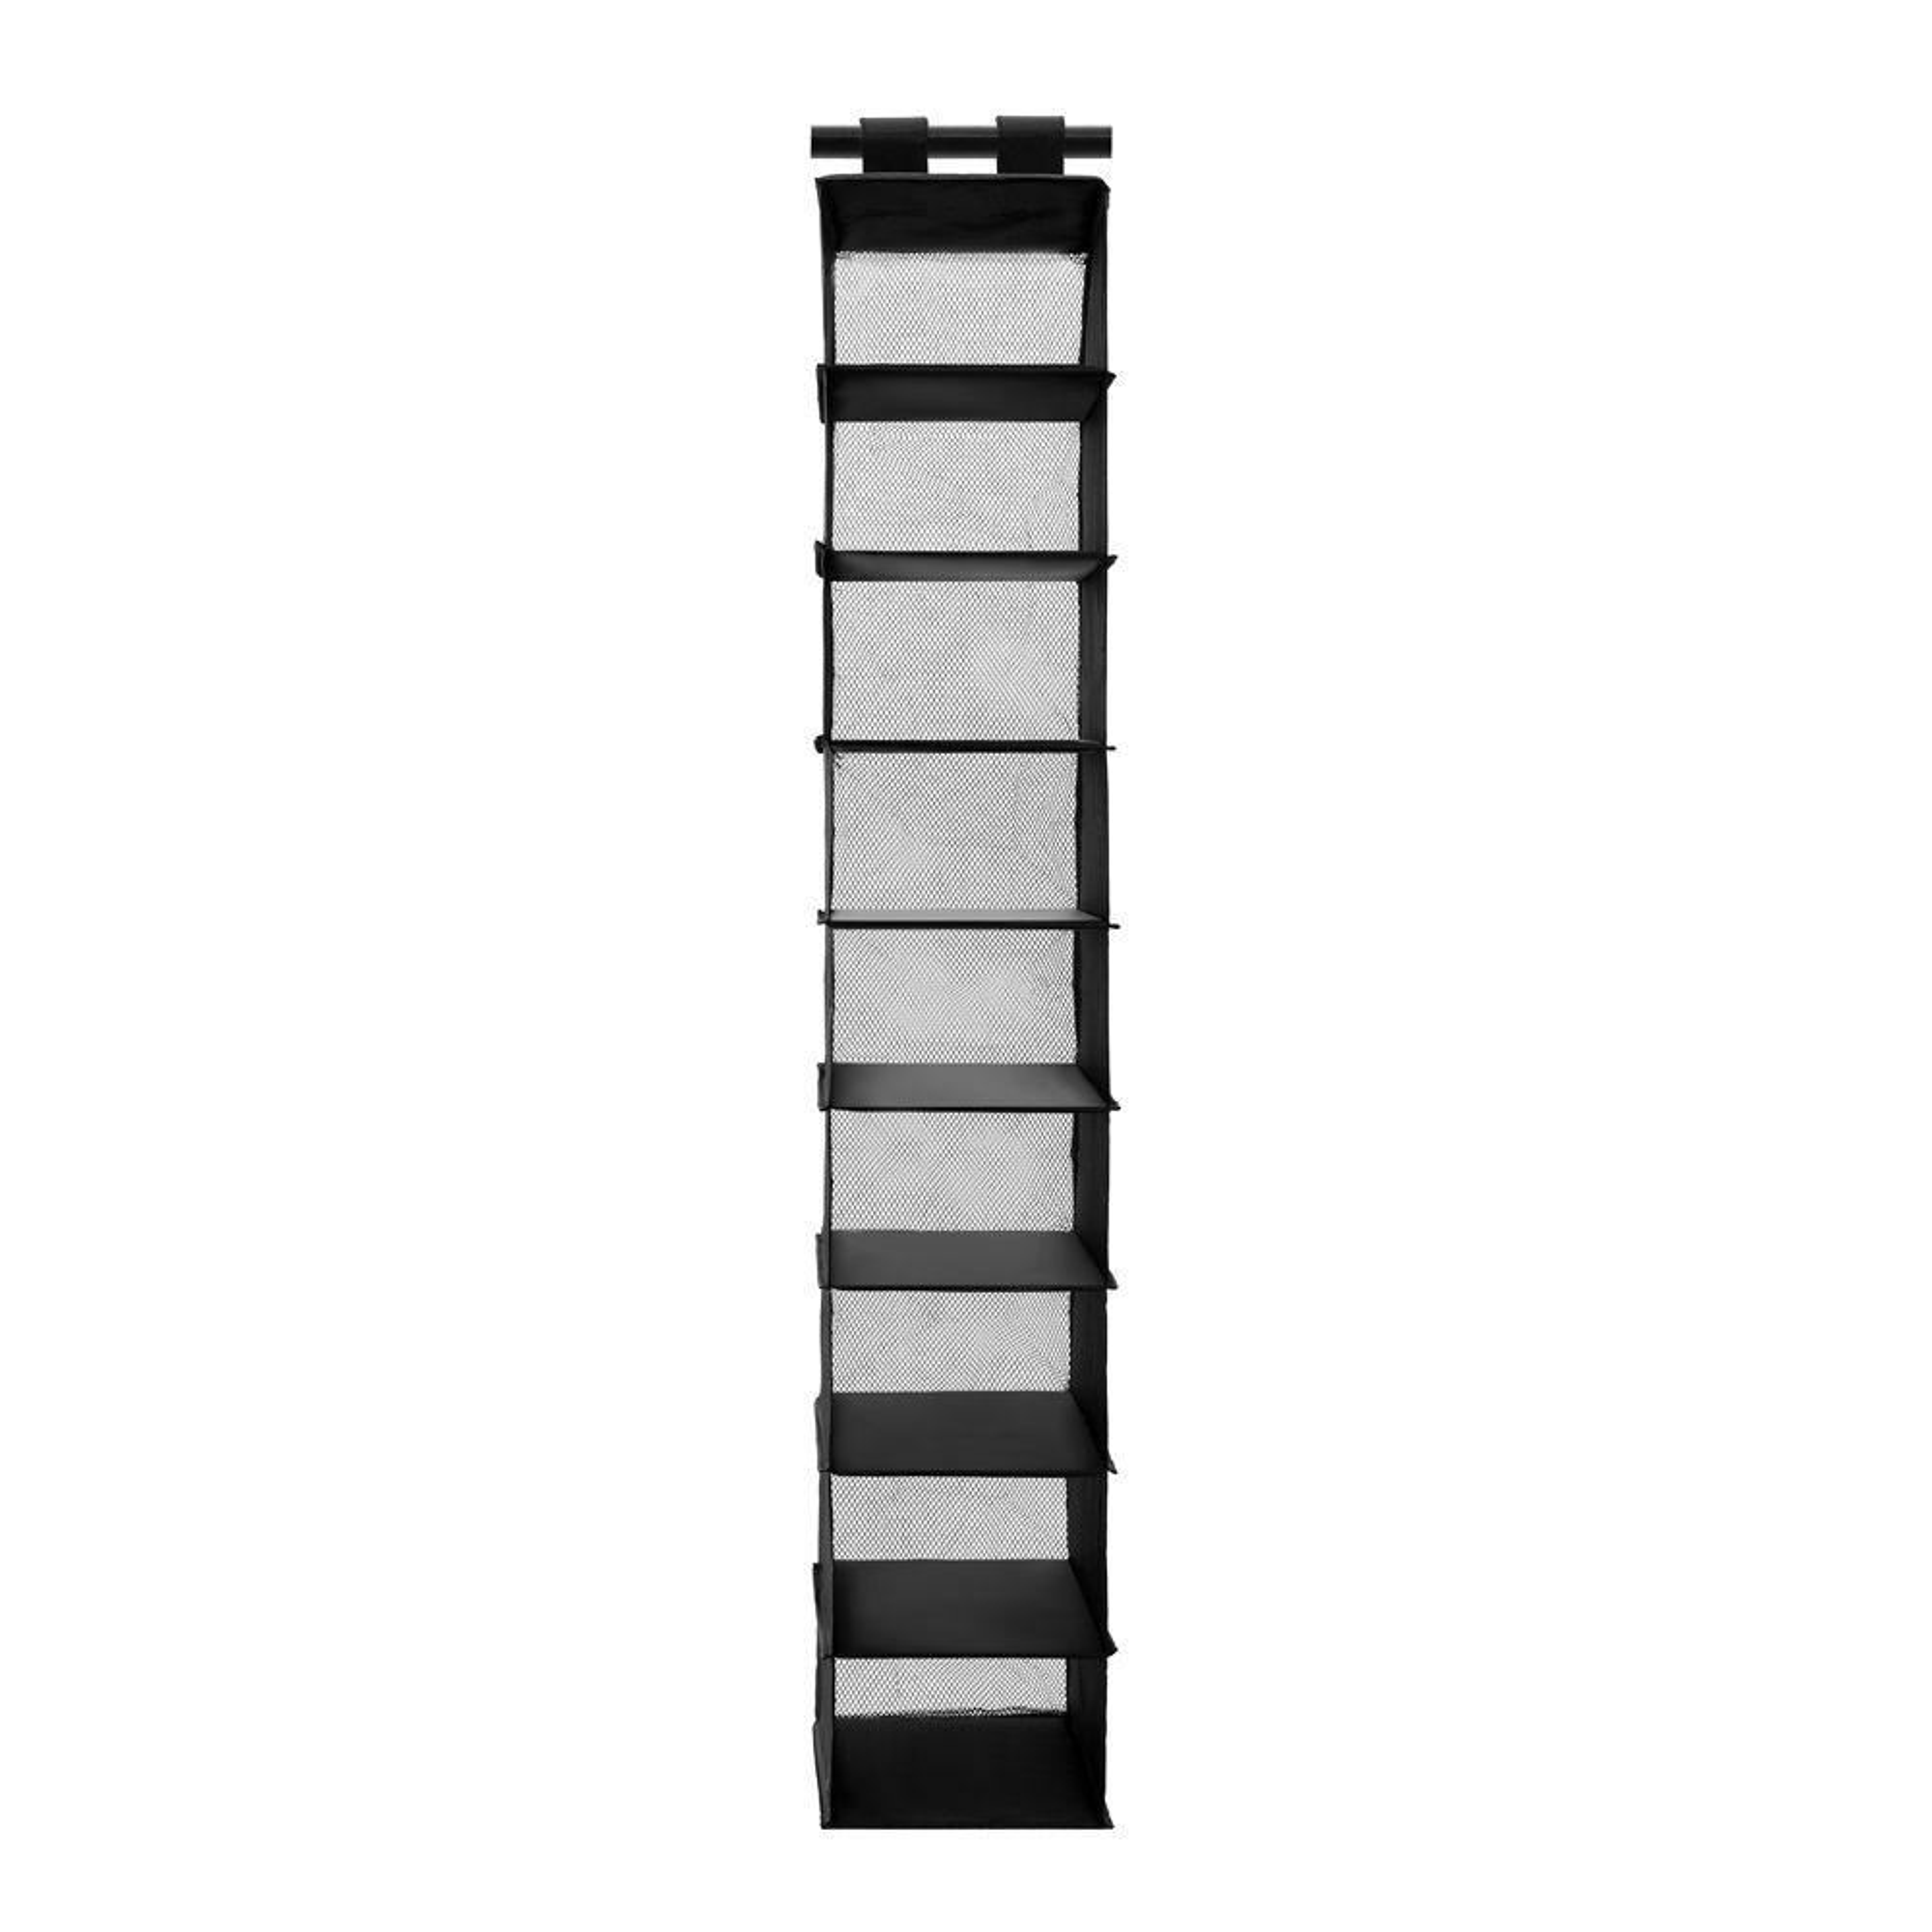 Kloset Soft Storage 9 Section Hanging Organiser Black 34 x 22 x 120cm | Home Storage & Living